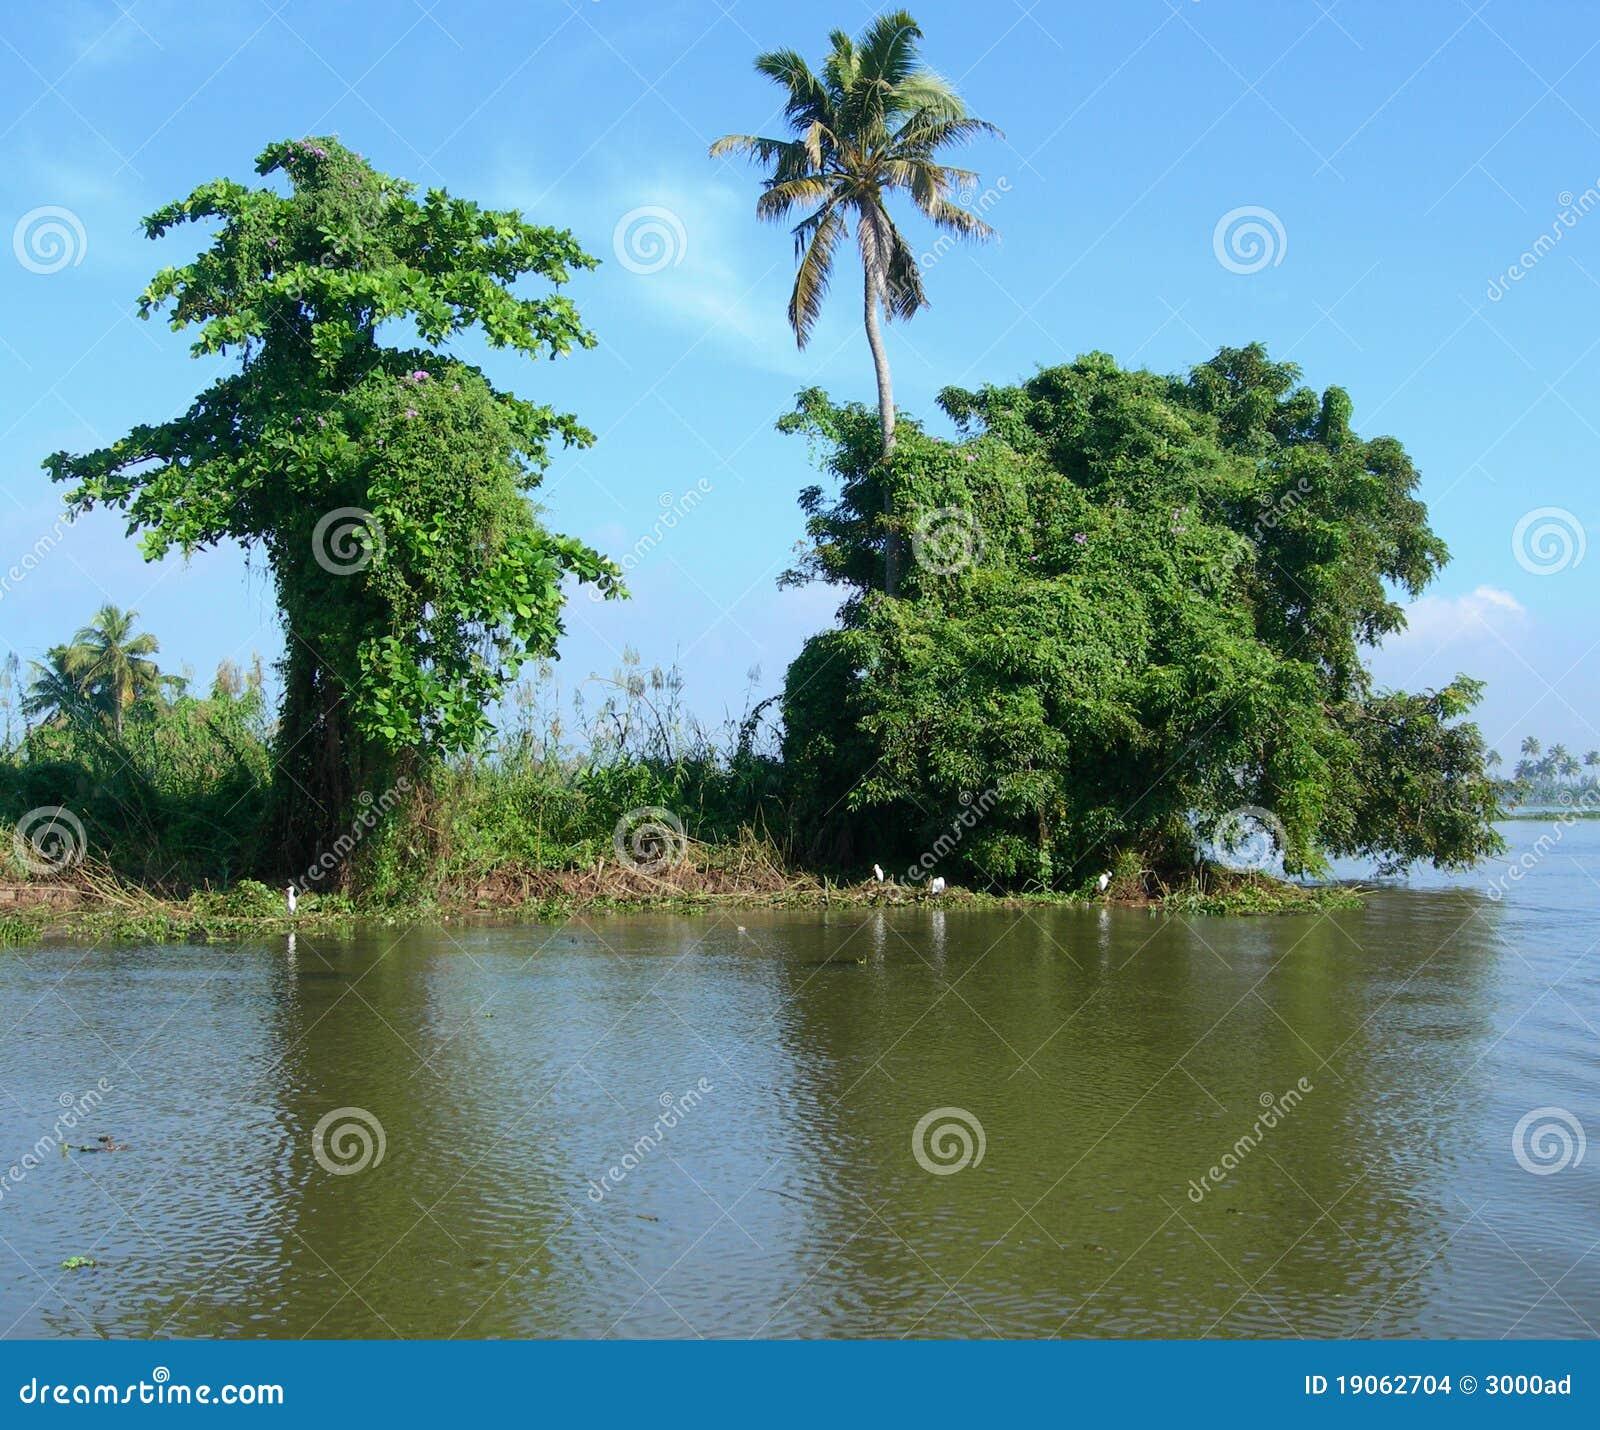 Tourism In India Lush Vegetation Kerala Stock Images